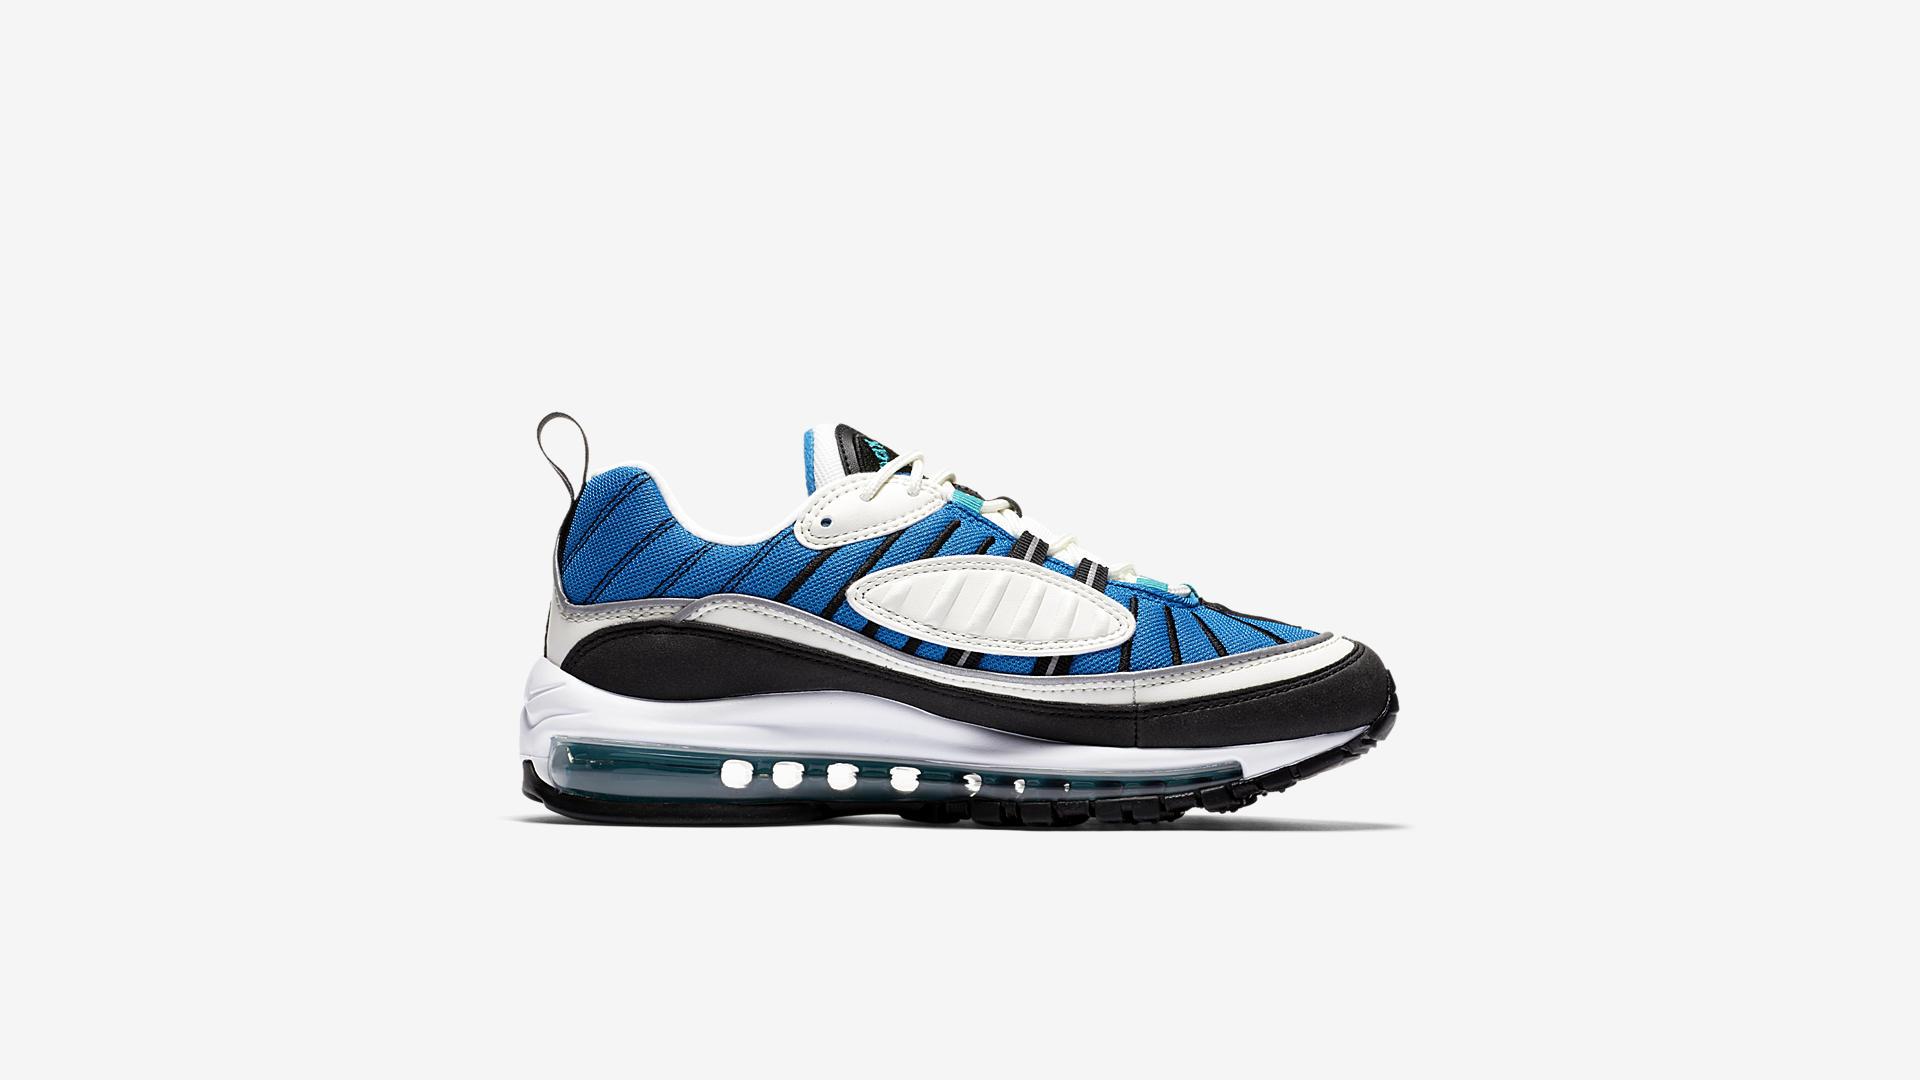 Nike Air Max 98 Blue Nebula / Radiant Emerald (AH6799-106)